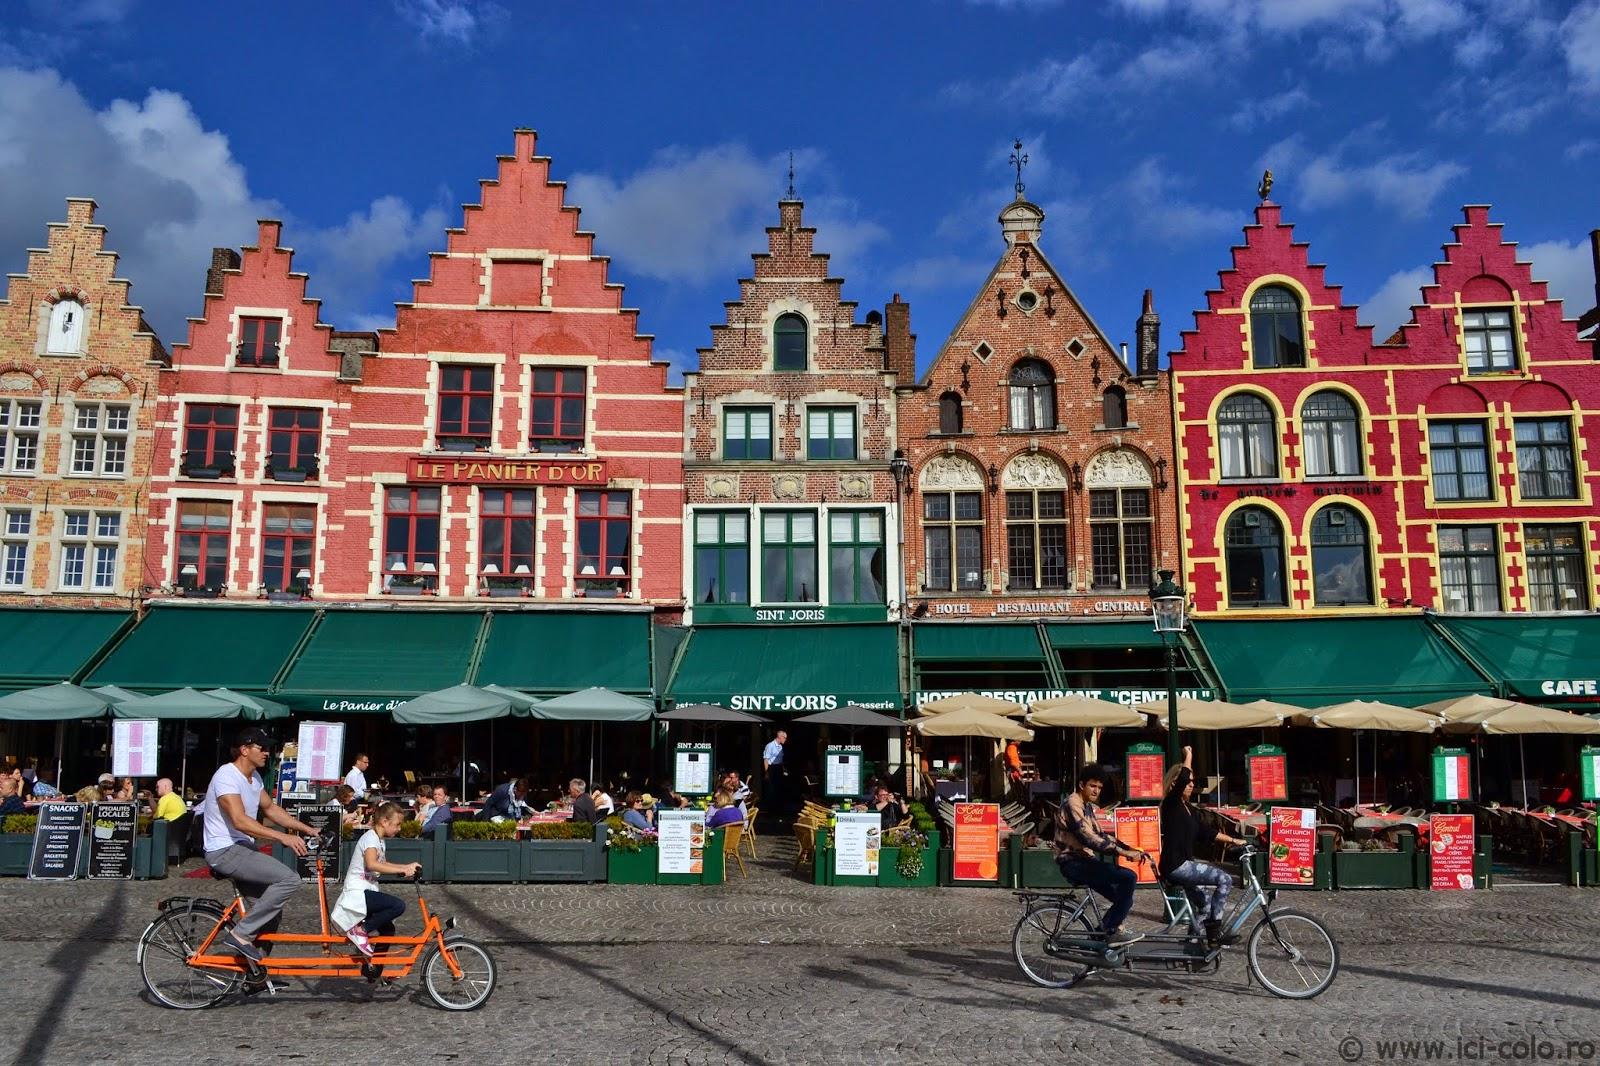 Bruges, Flandra, Belgia - ici-colo.ro